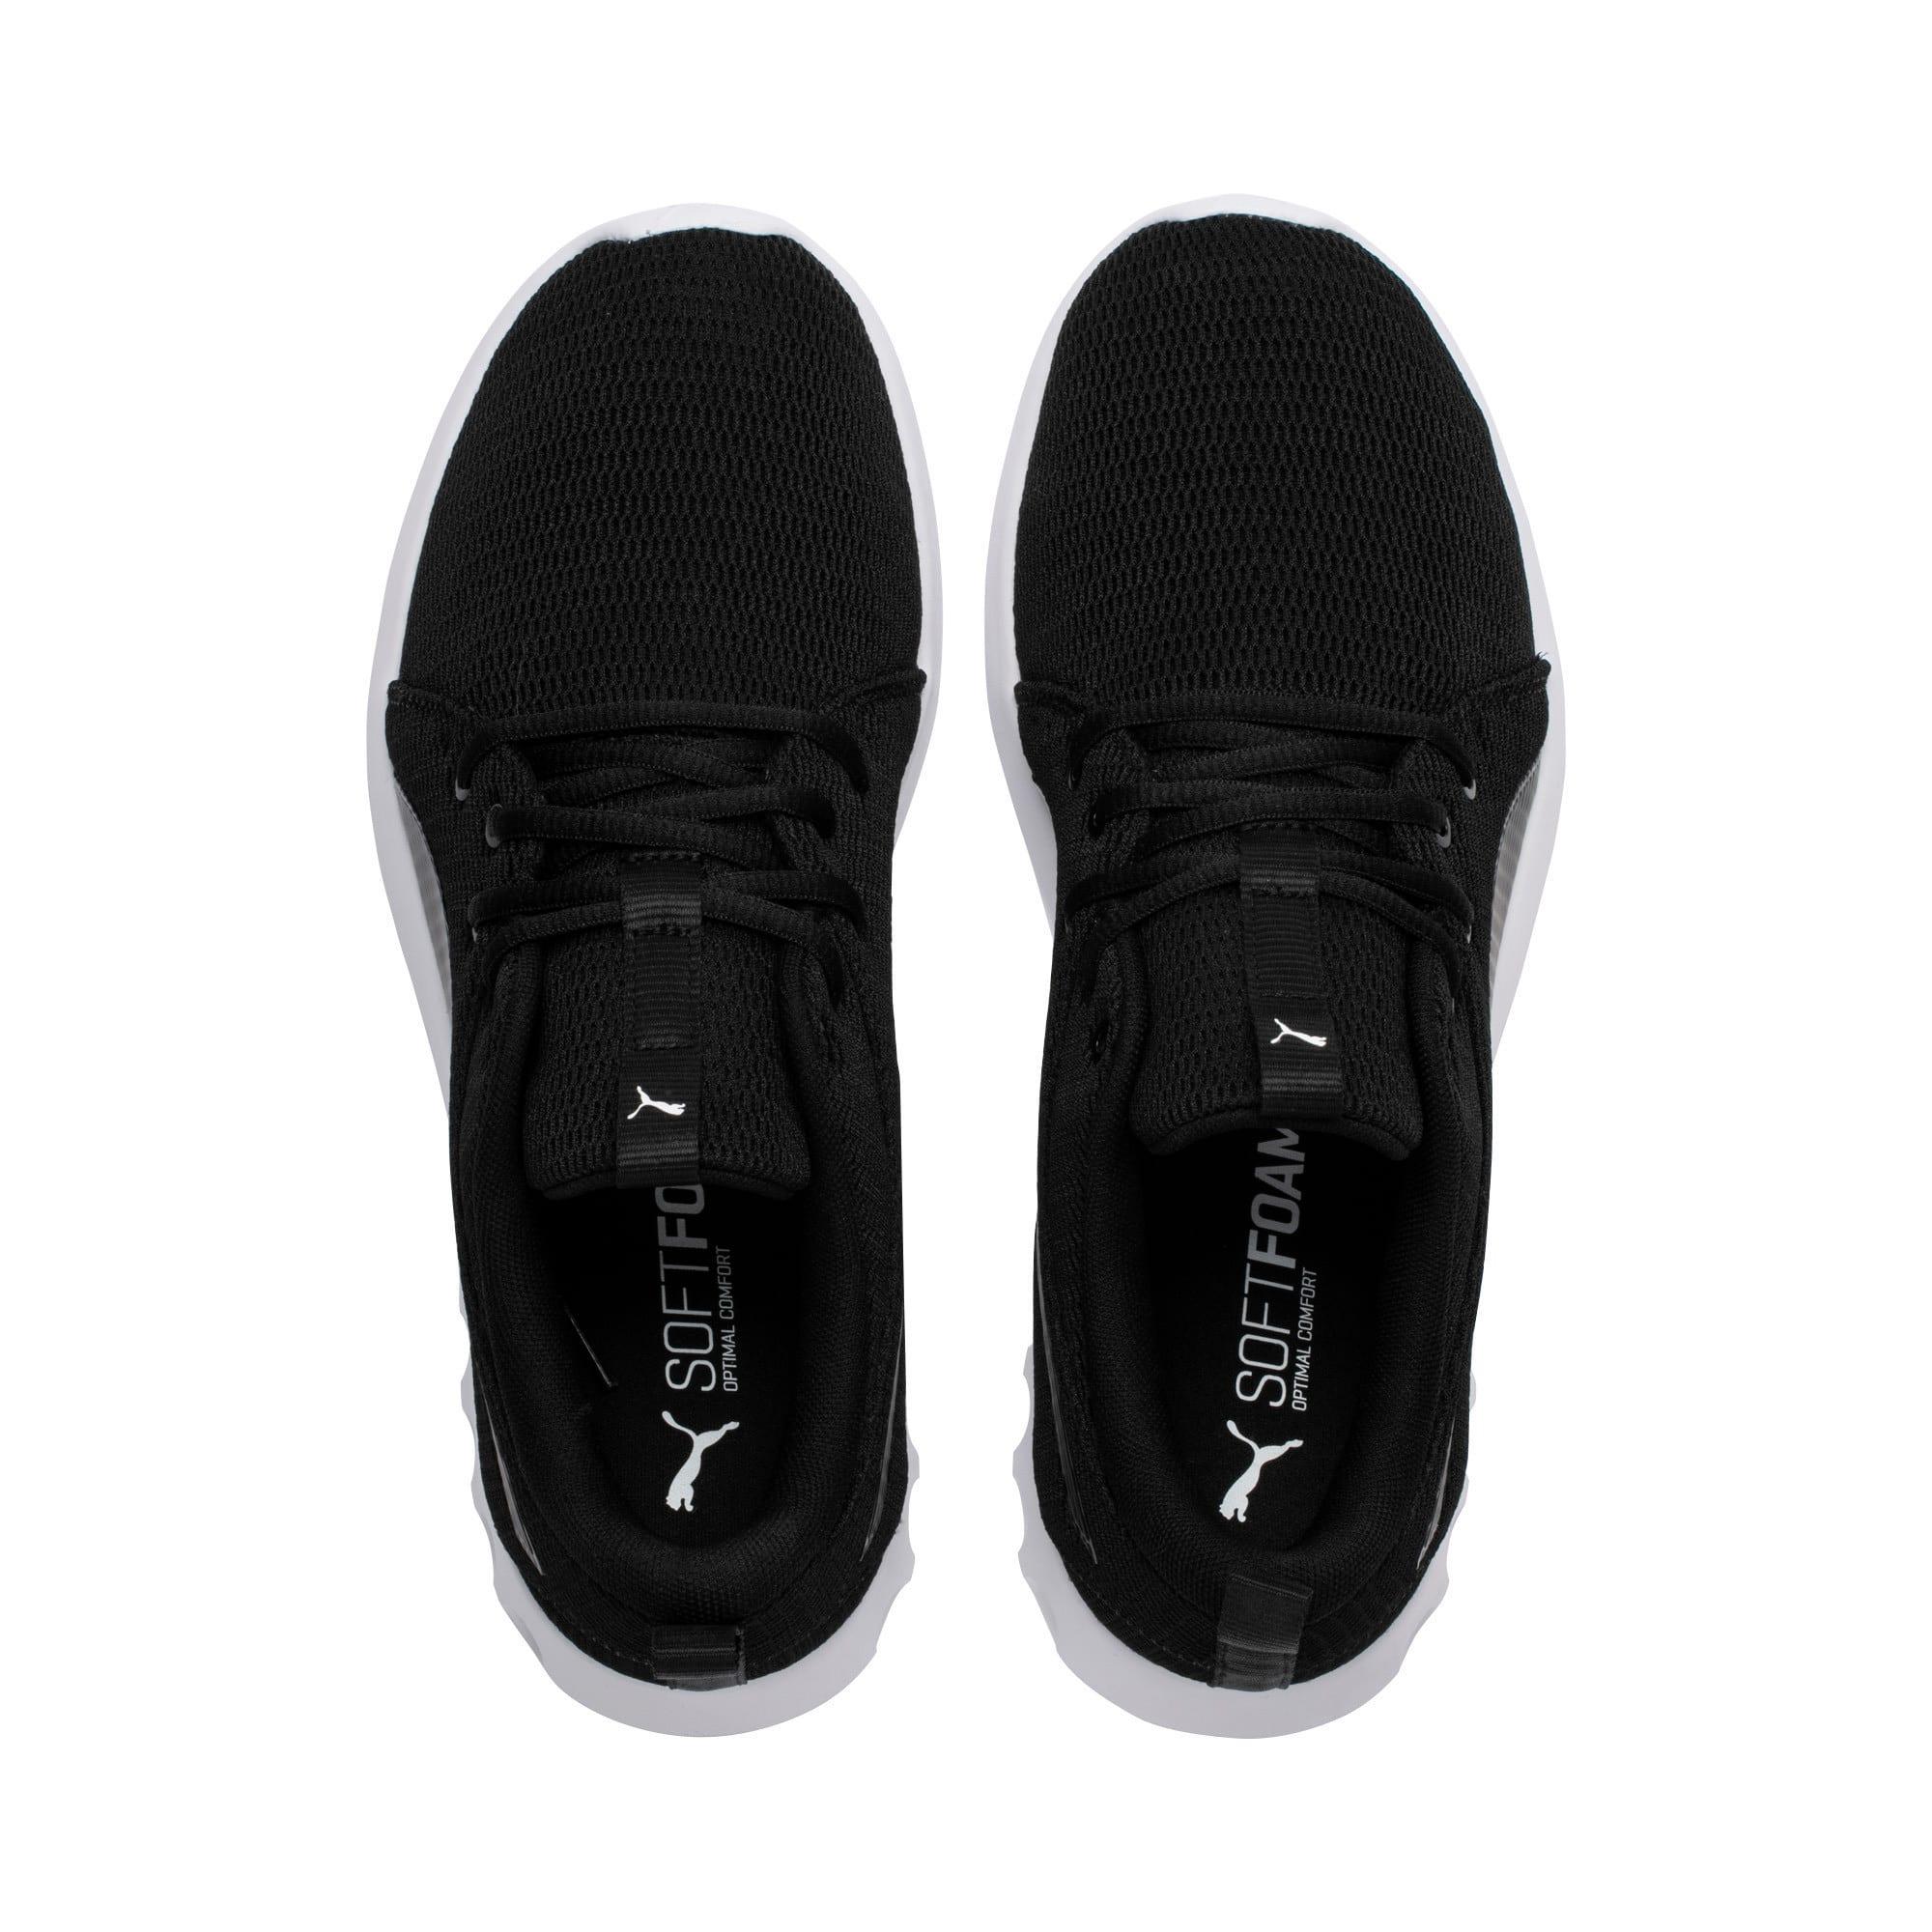 Miniatura 6 de Zapatos para correrCarson 2 New Corepara hombre, Puma Black-Puma White, mediano